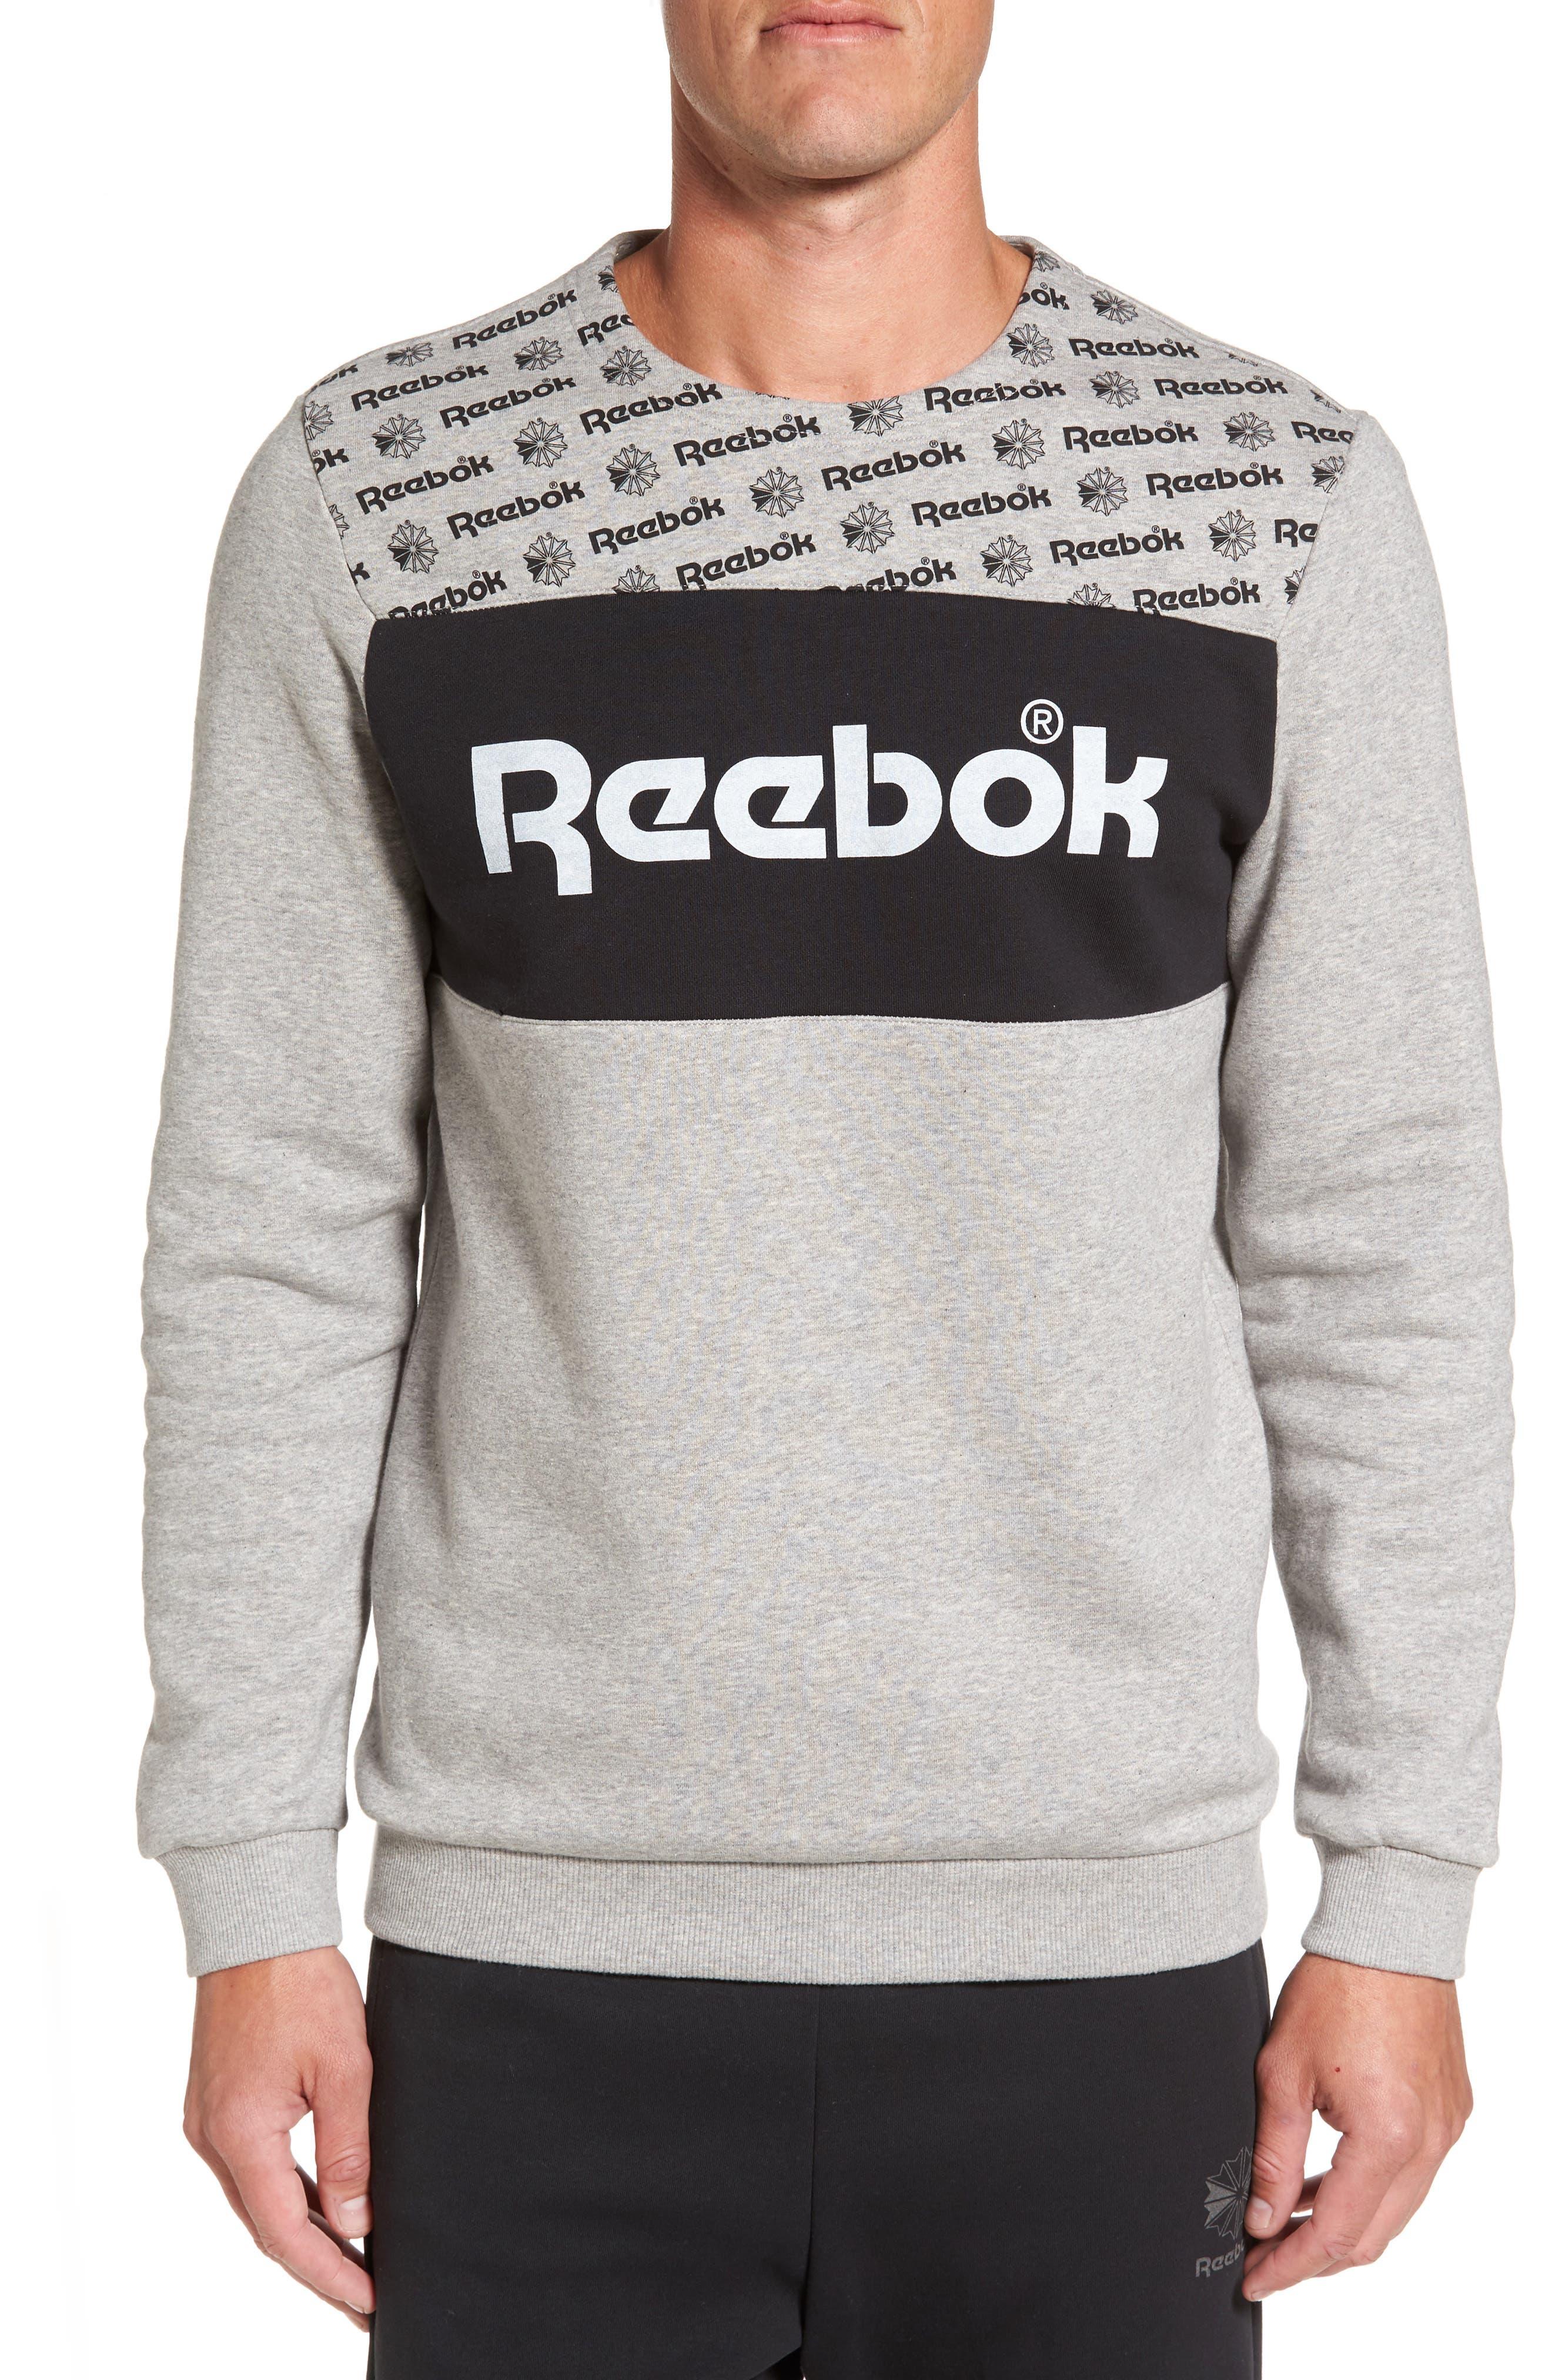 REEBOK Graphic Crewneck Sweatshirt